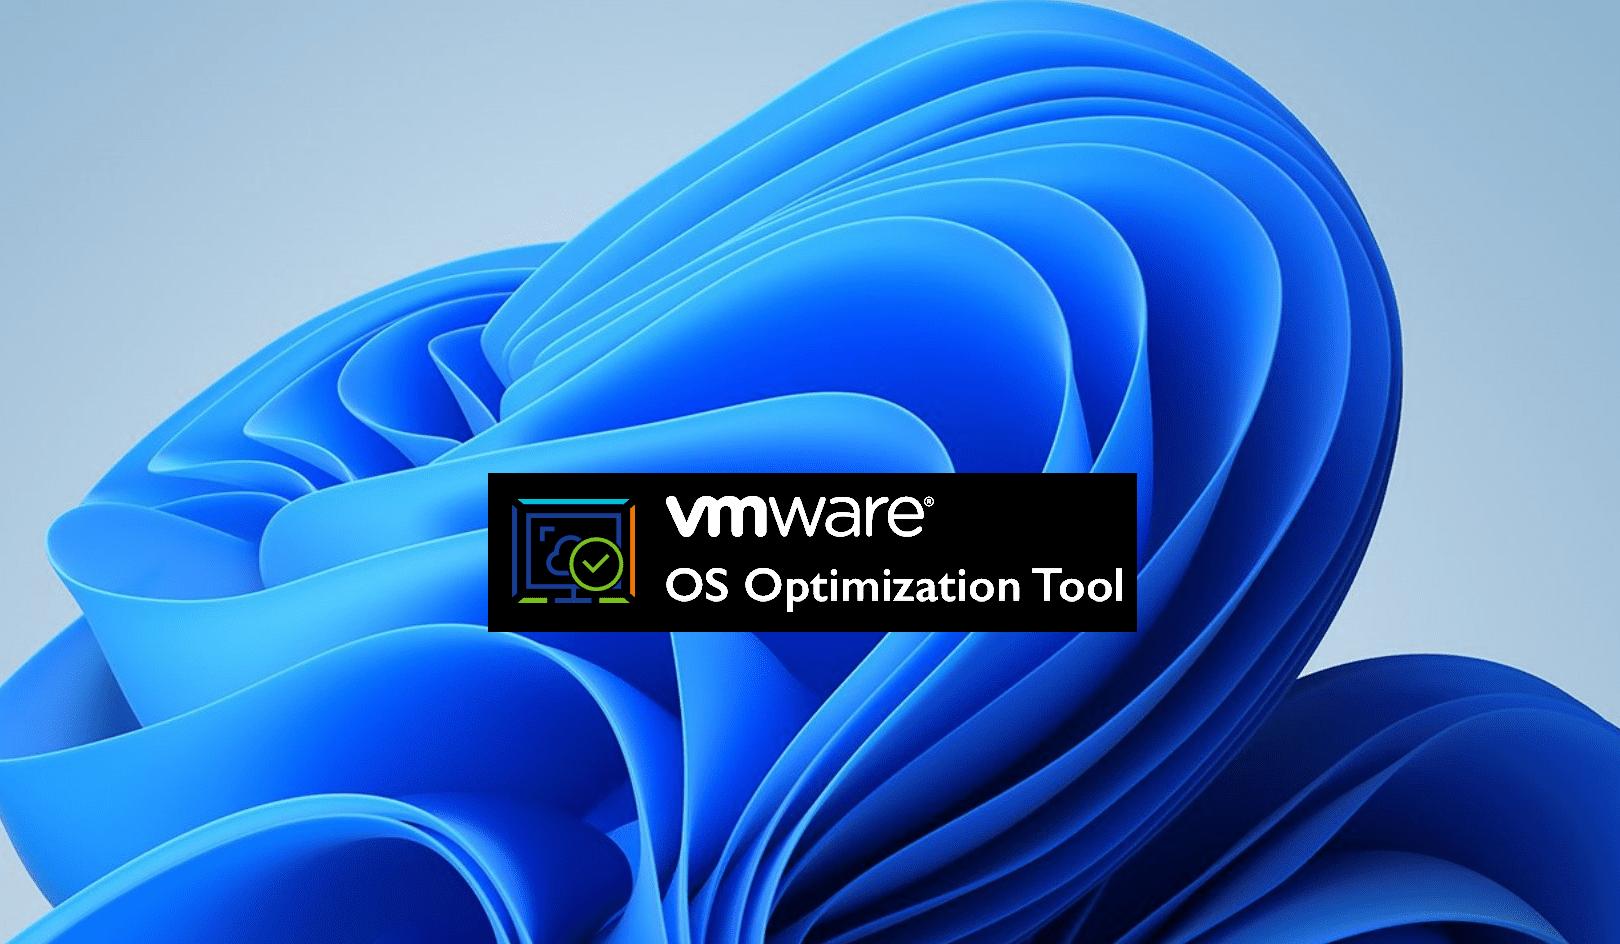 Running the VMware OS Optimization Tool in Windows 11